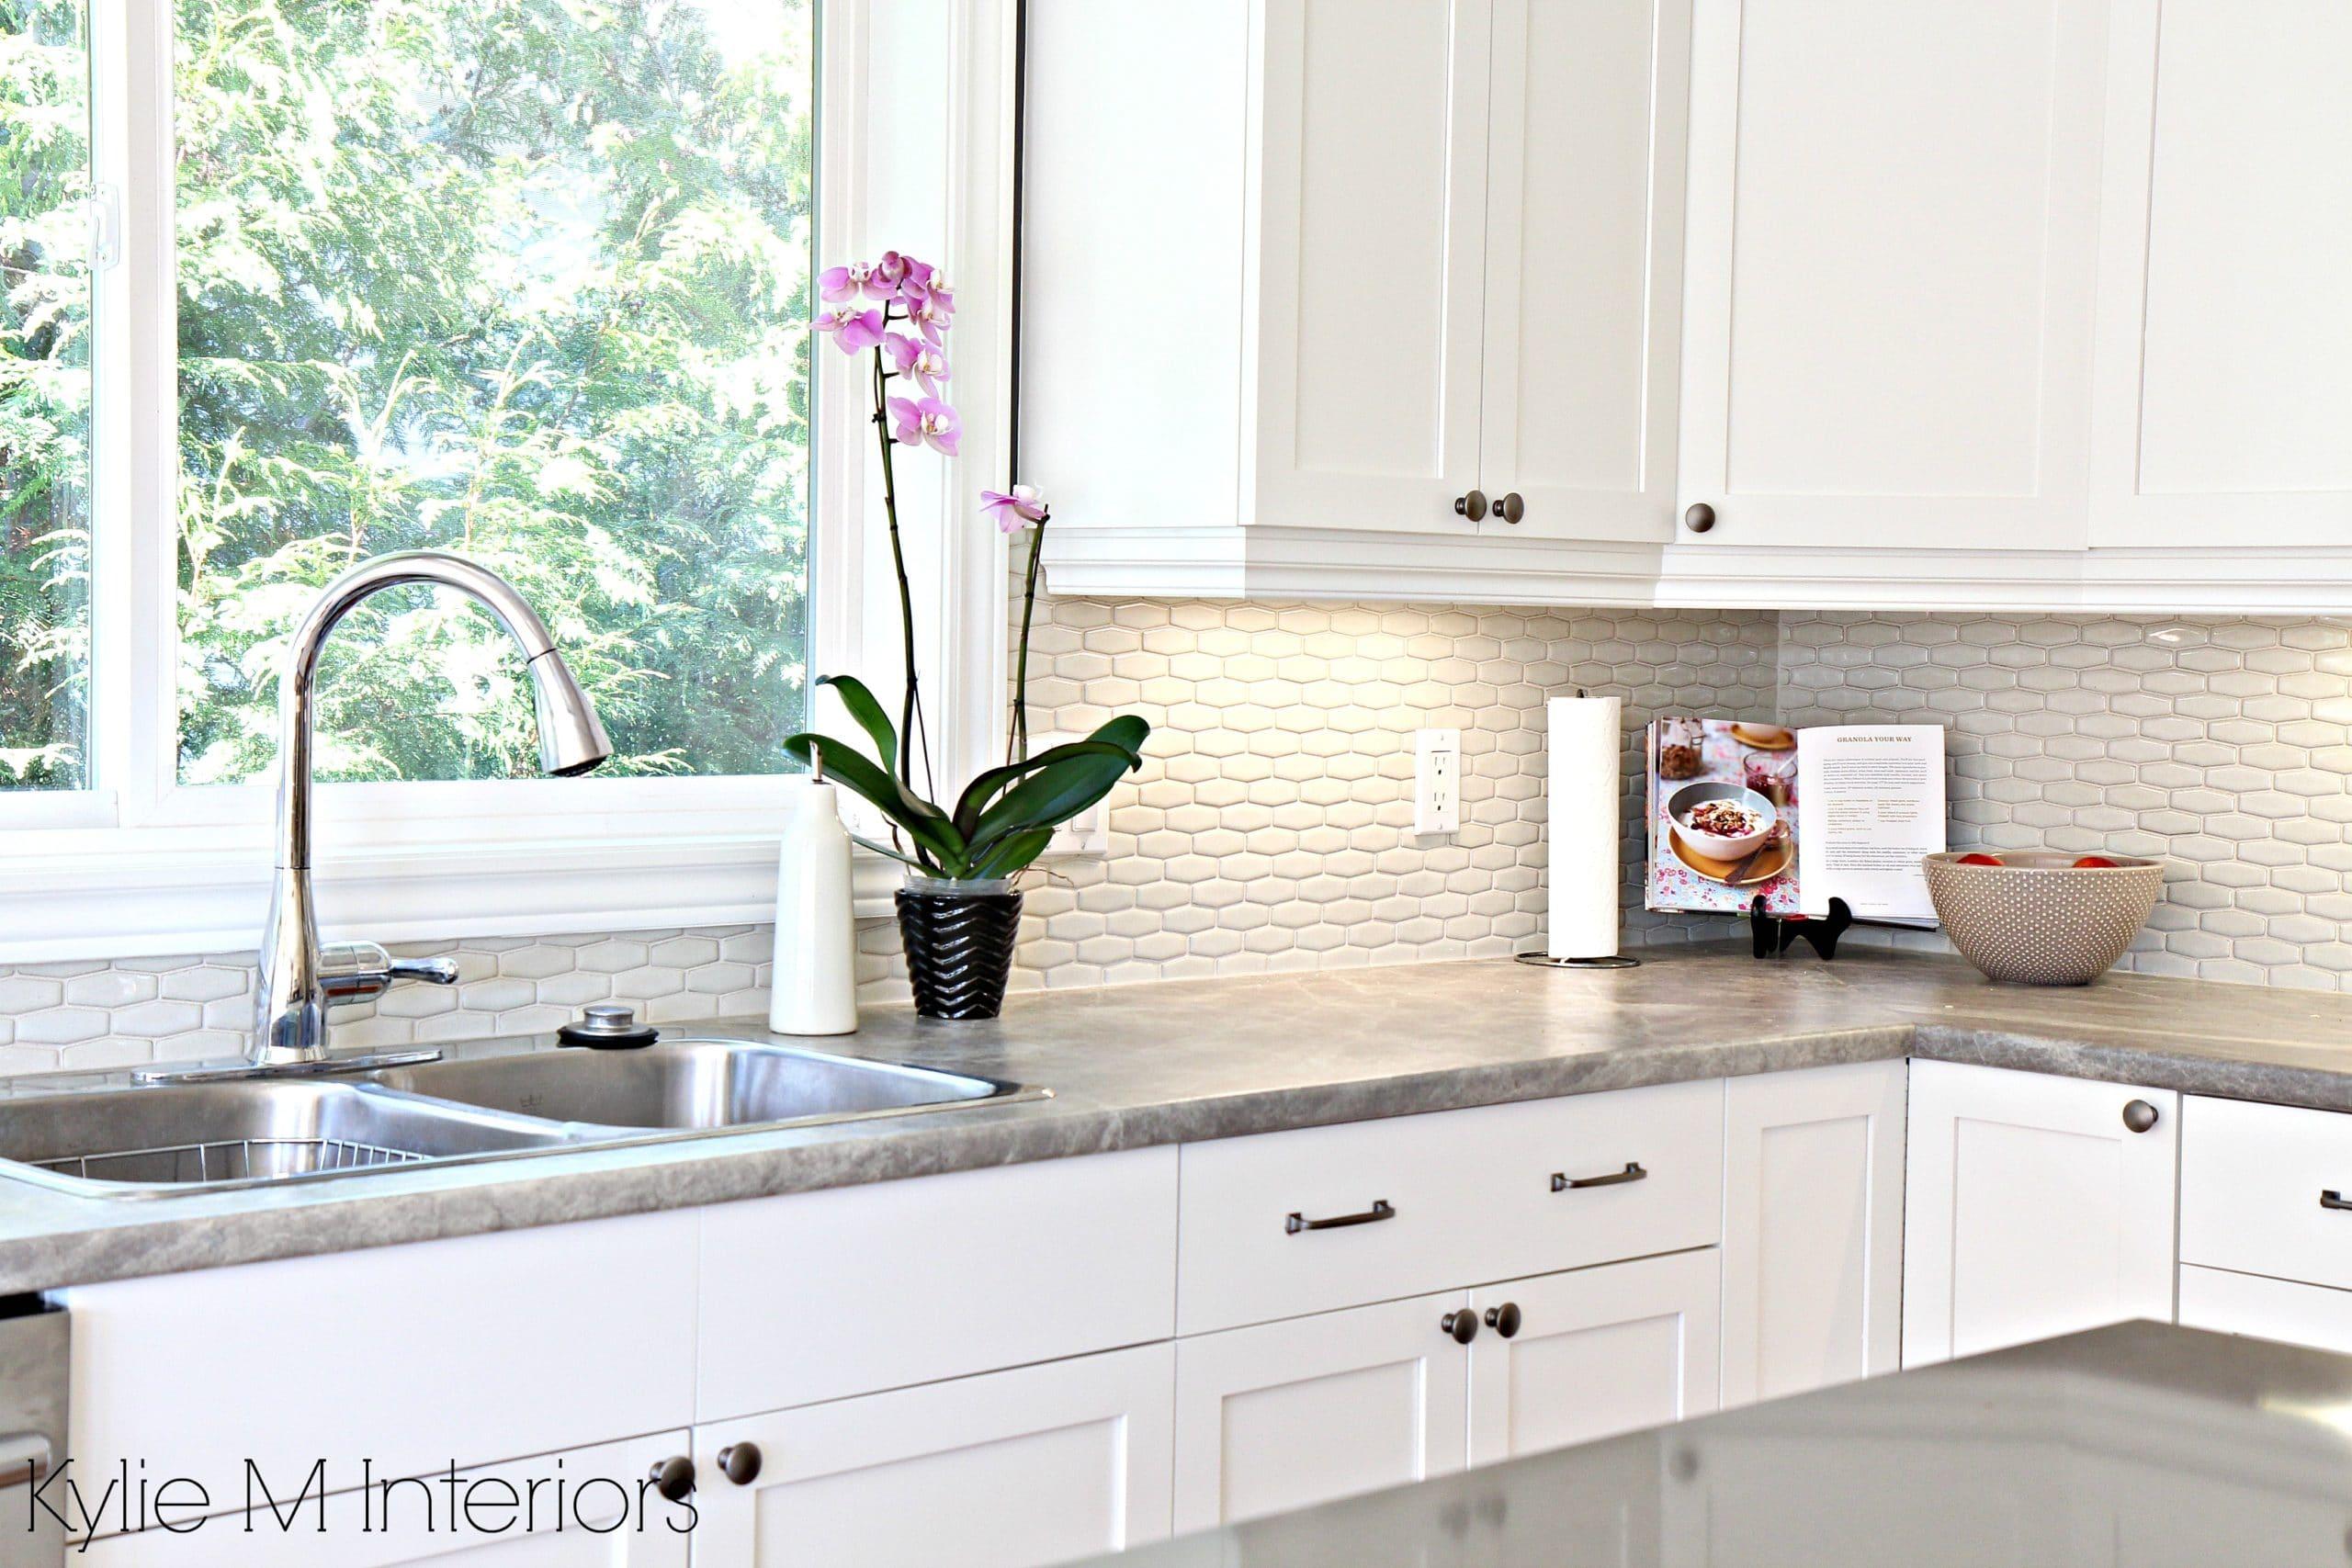 hexagon subway tile backsplash. Maple cabinets painted ... on Backsplash For Maple Cabinets  id=87488